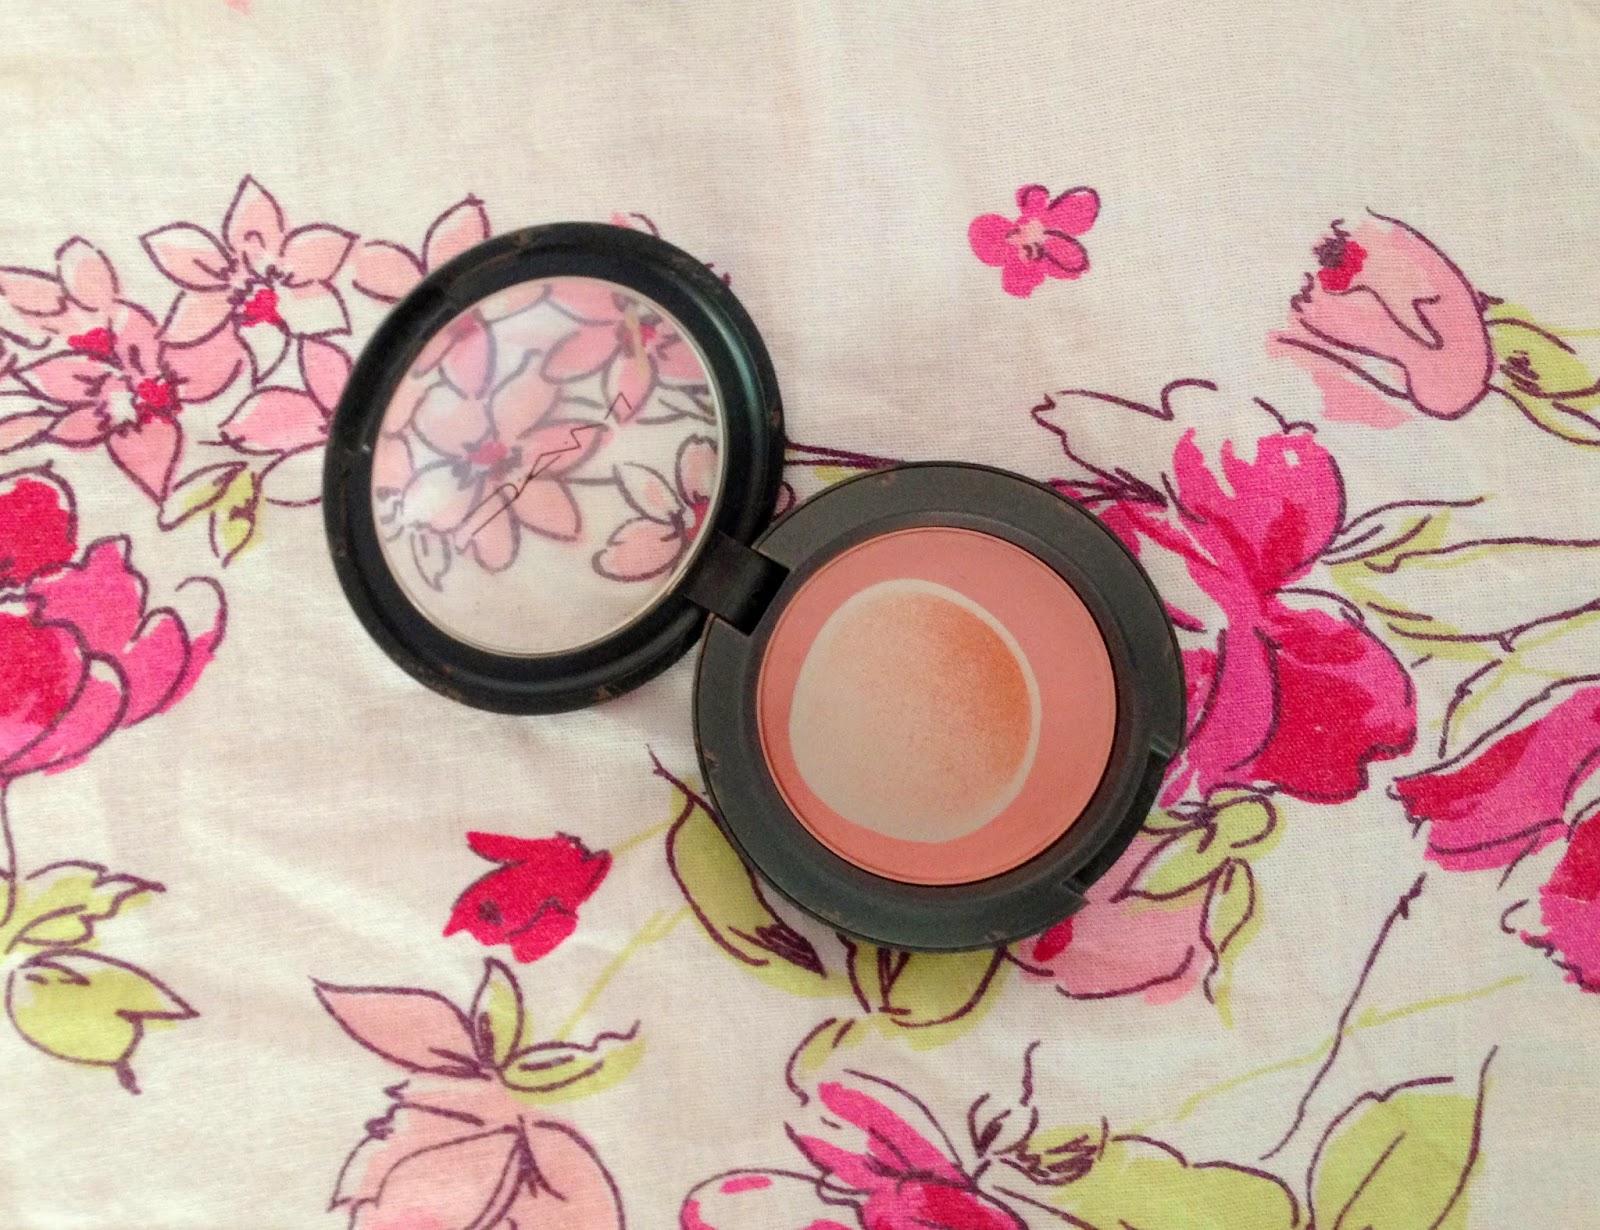 Letmecrossover_project_pan_ten_10_beauty_blog_products_mac_blush_mocha